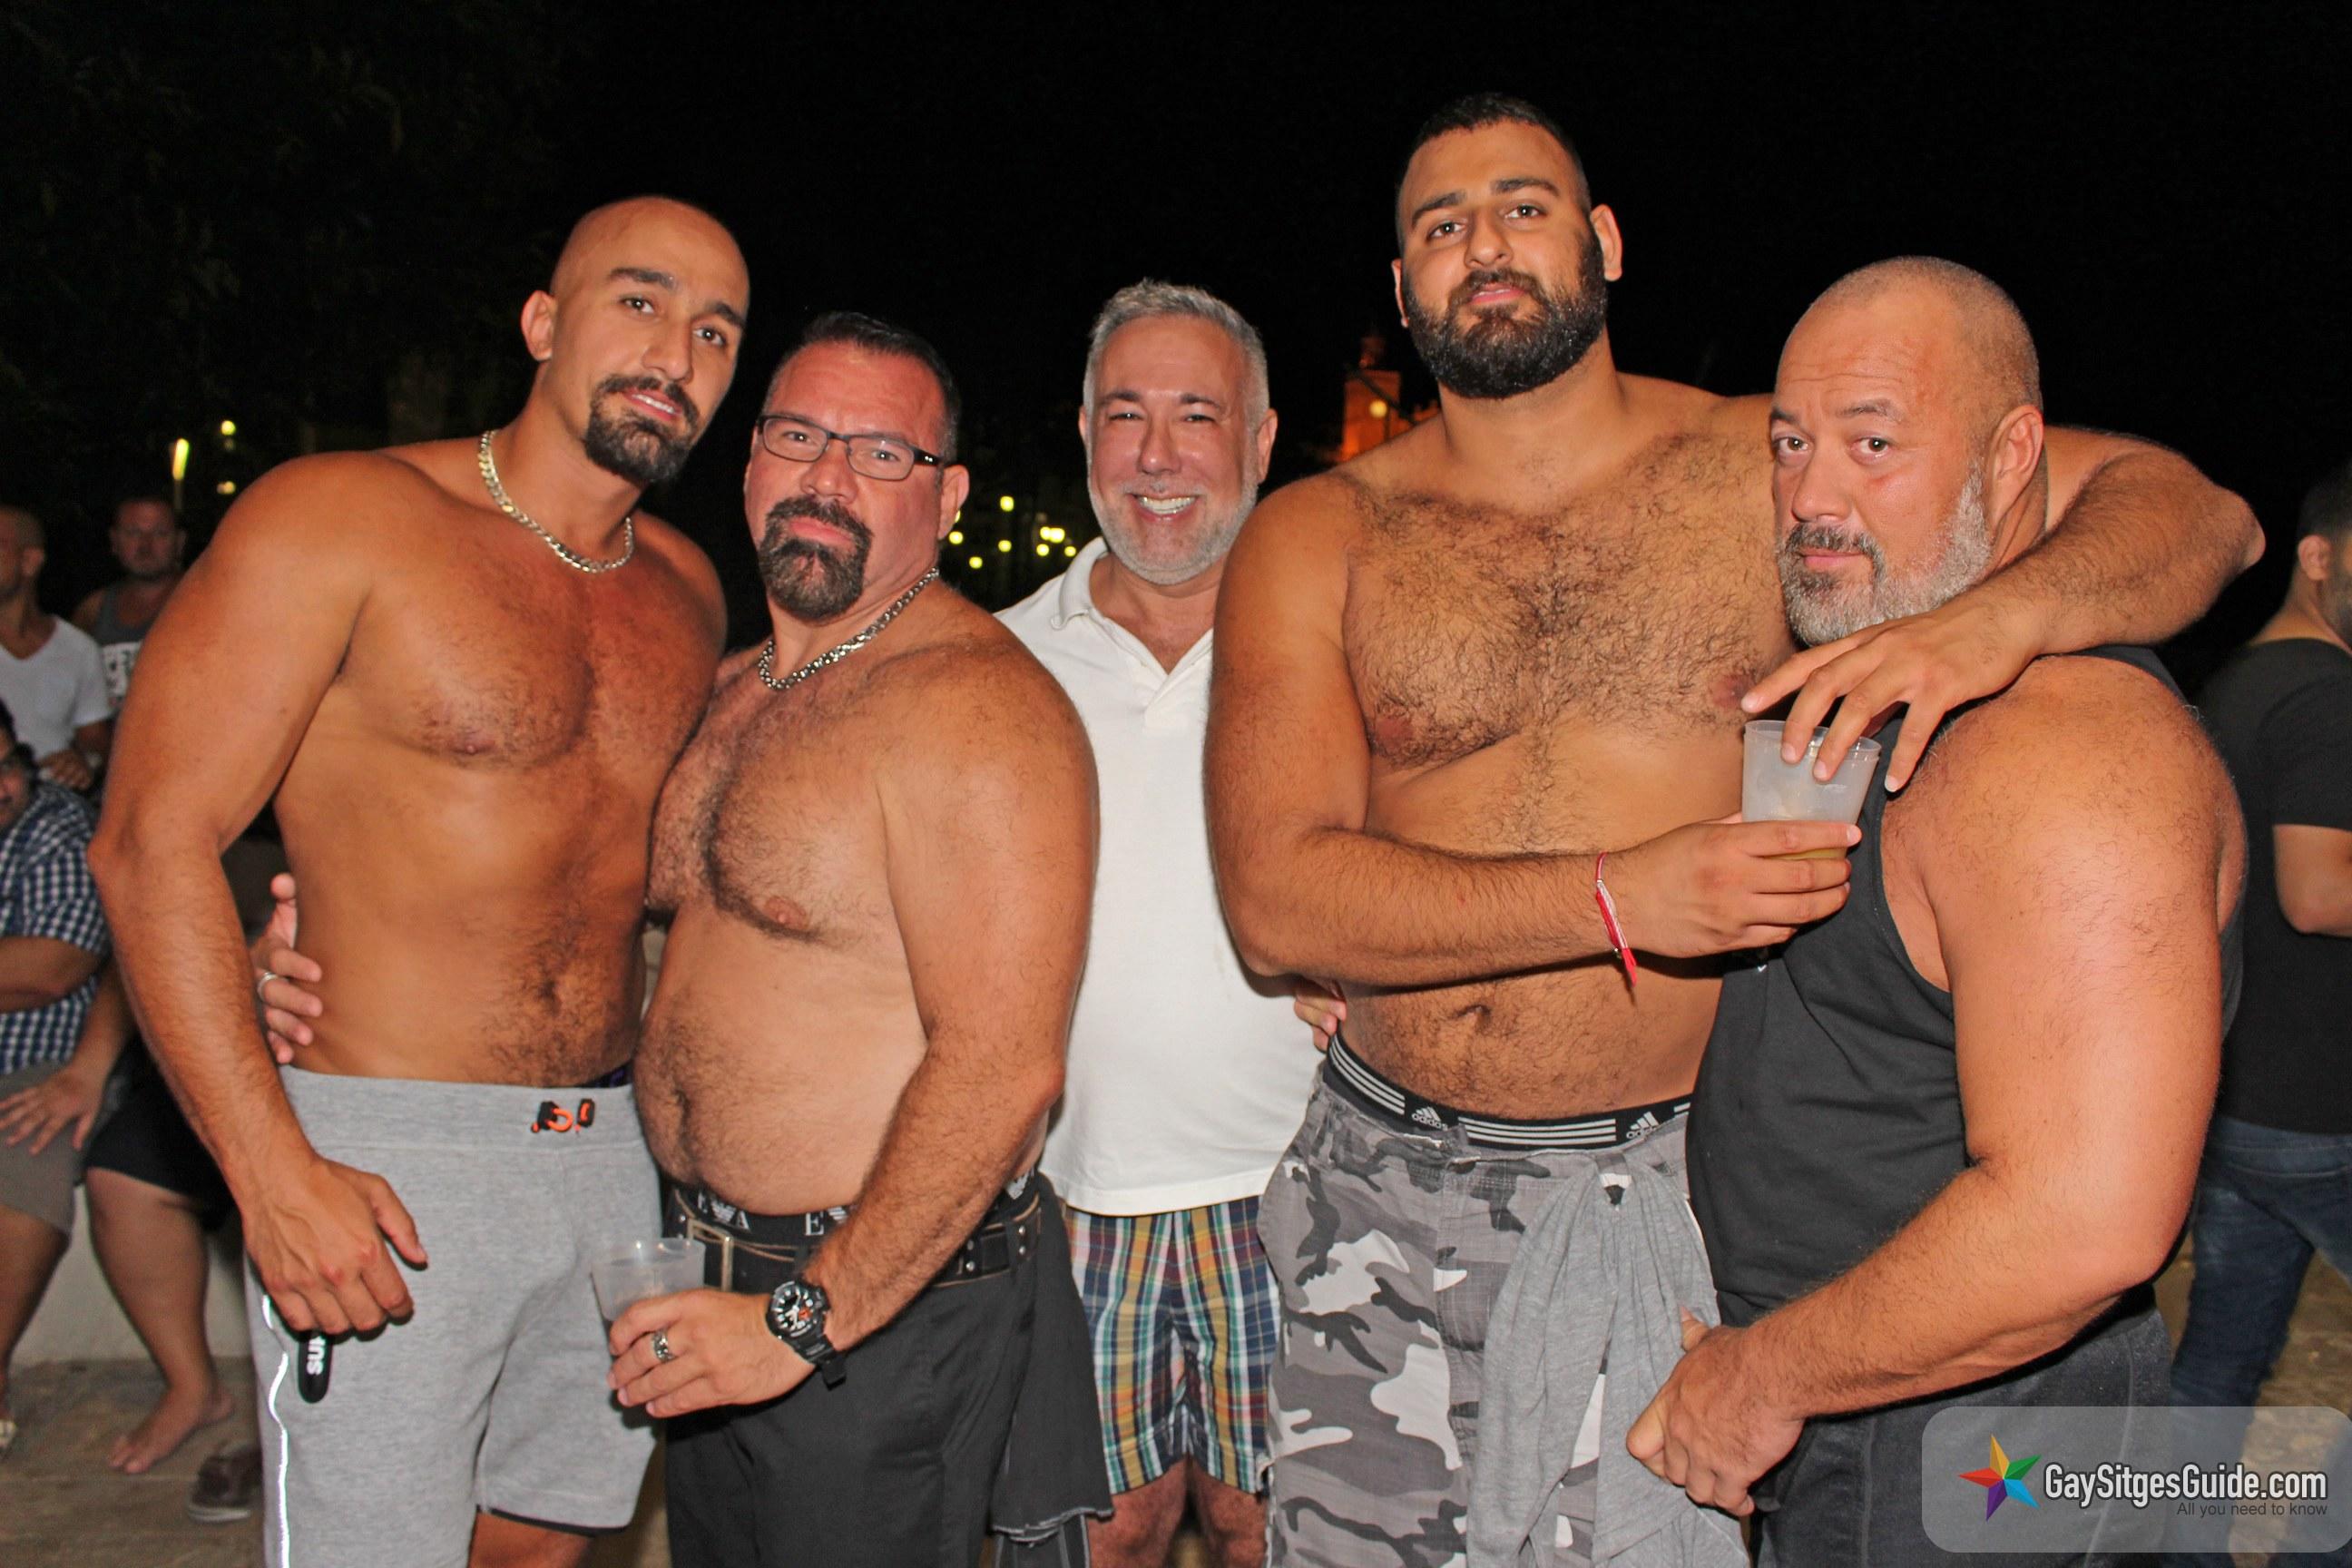 gay hotels france